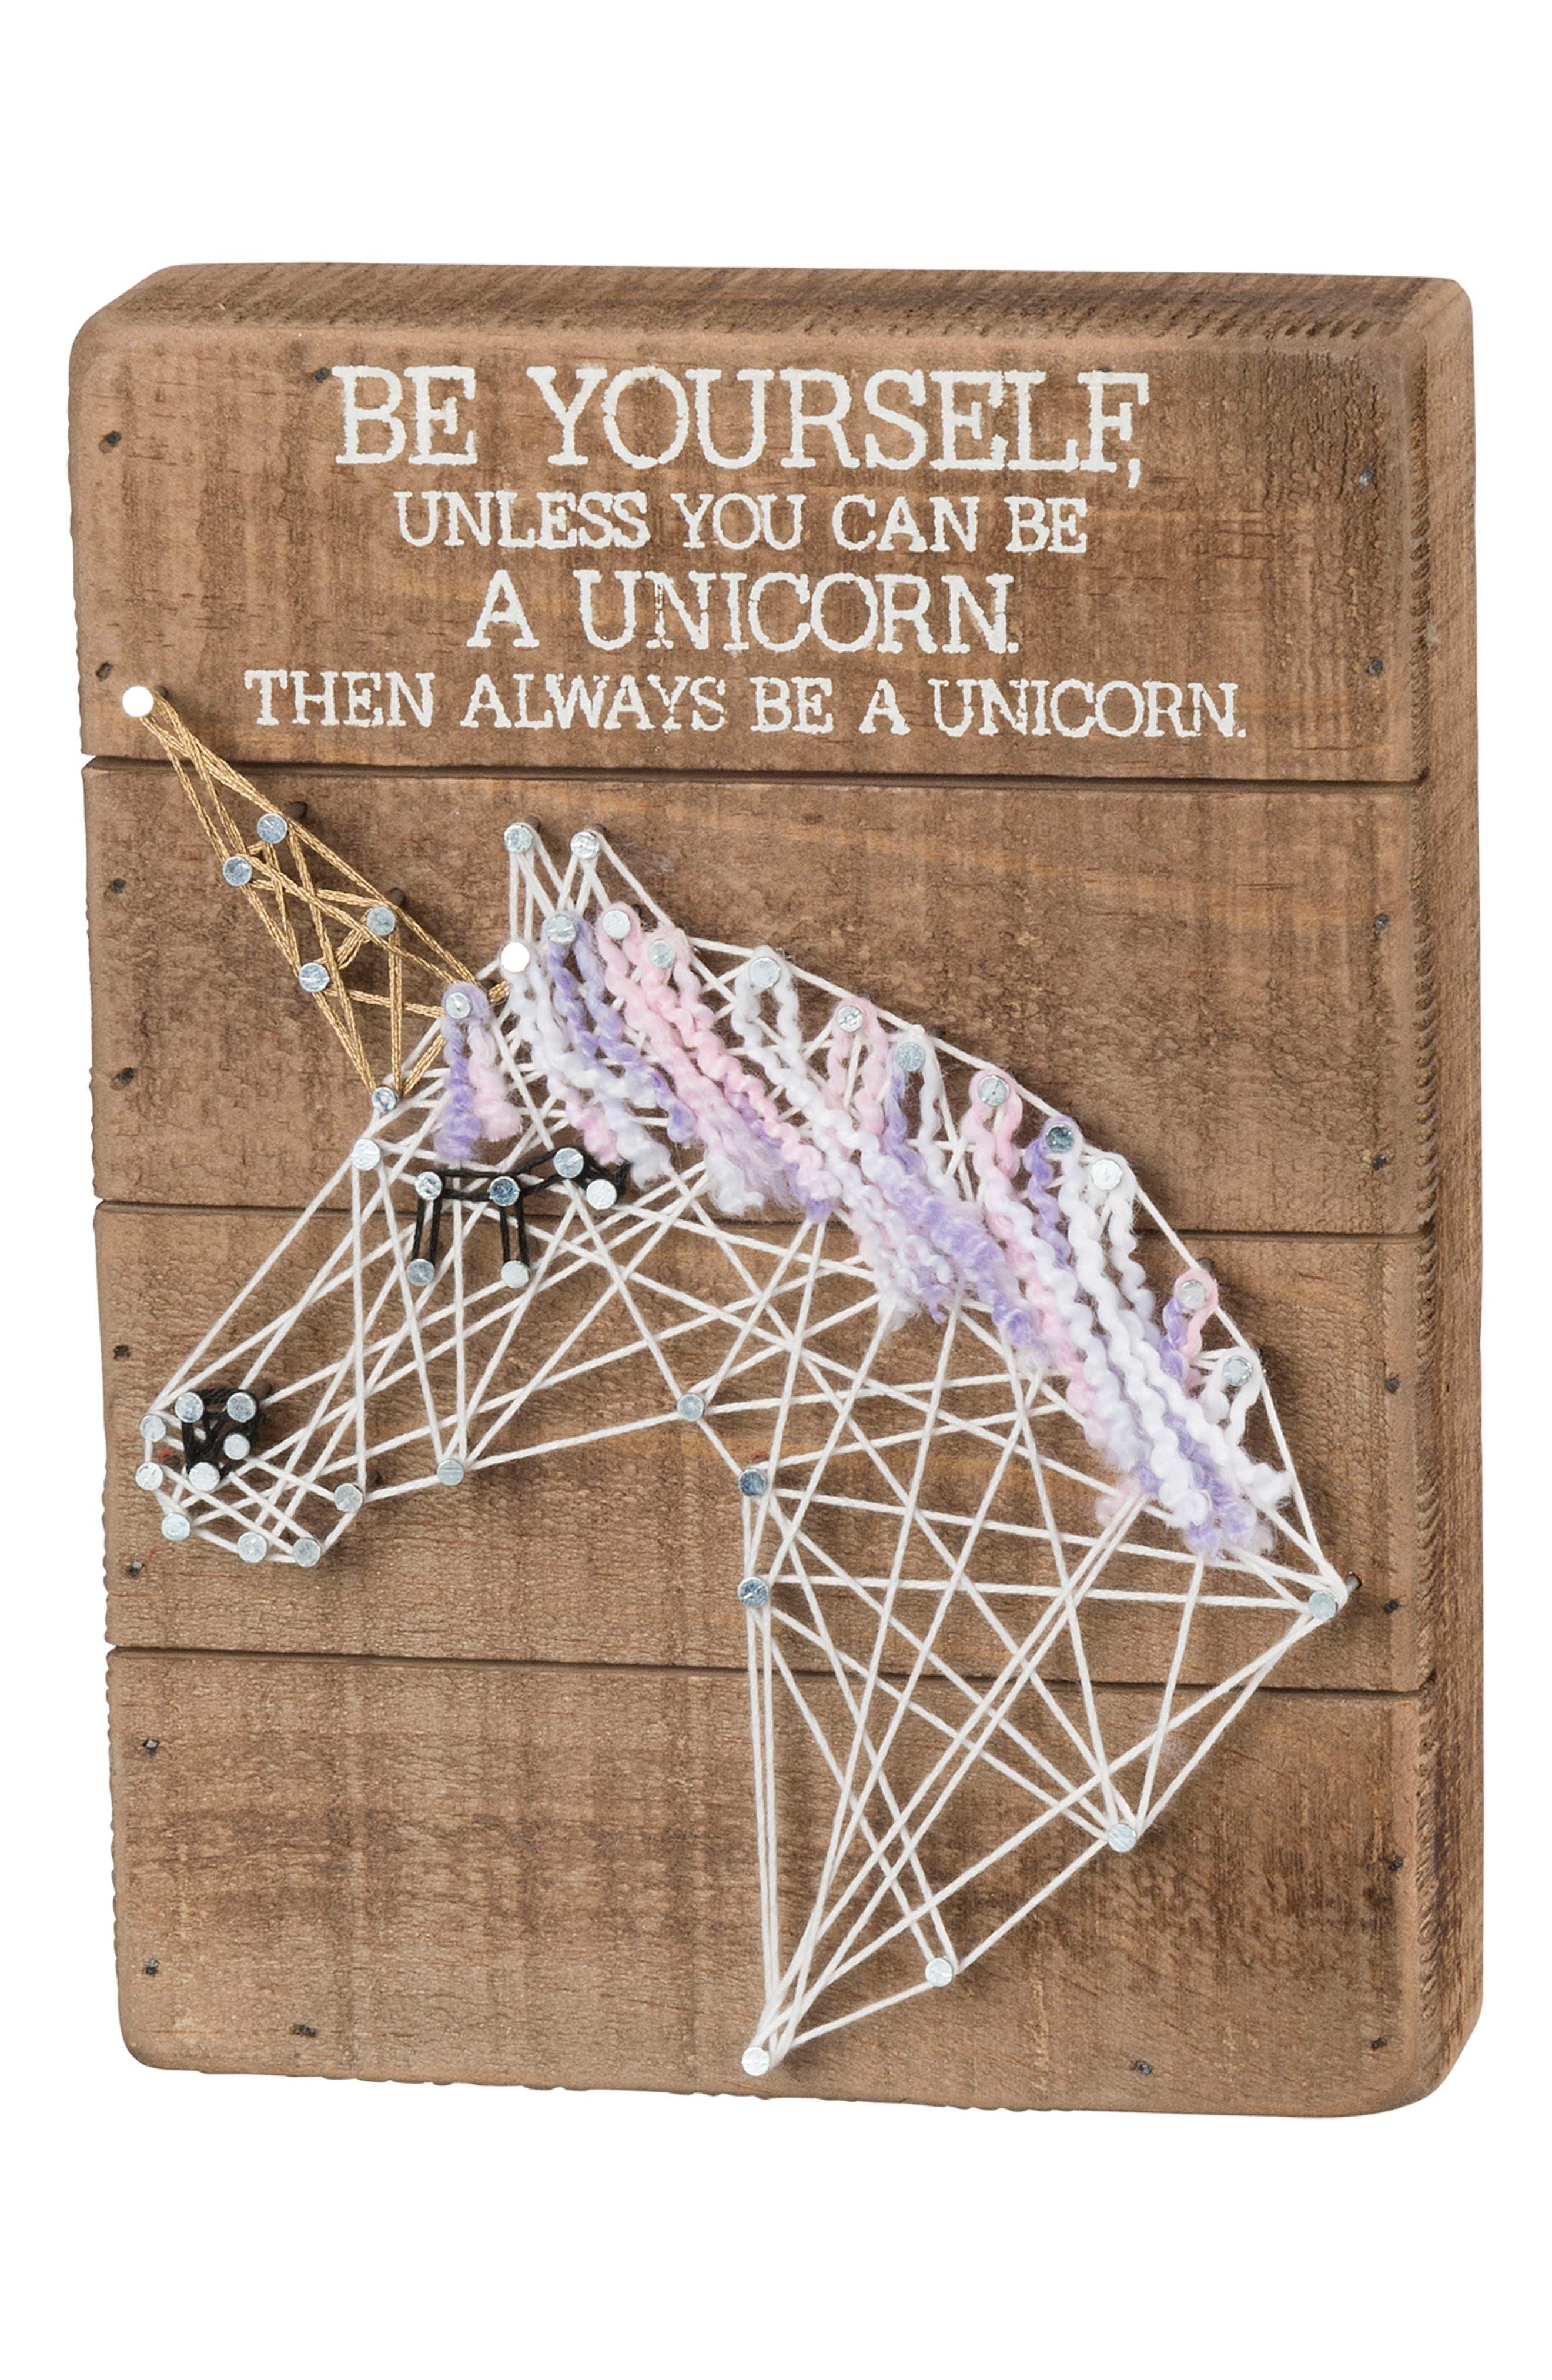 Primitives by Kathy Unicorn String Art Box Sign